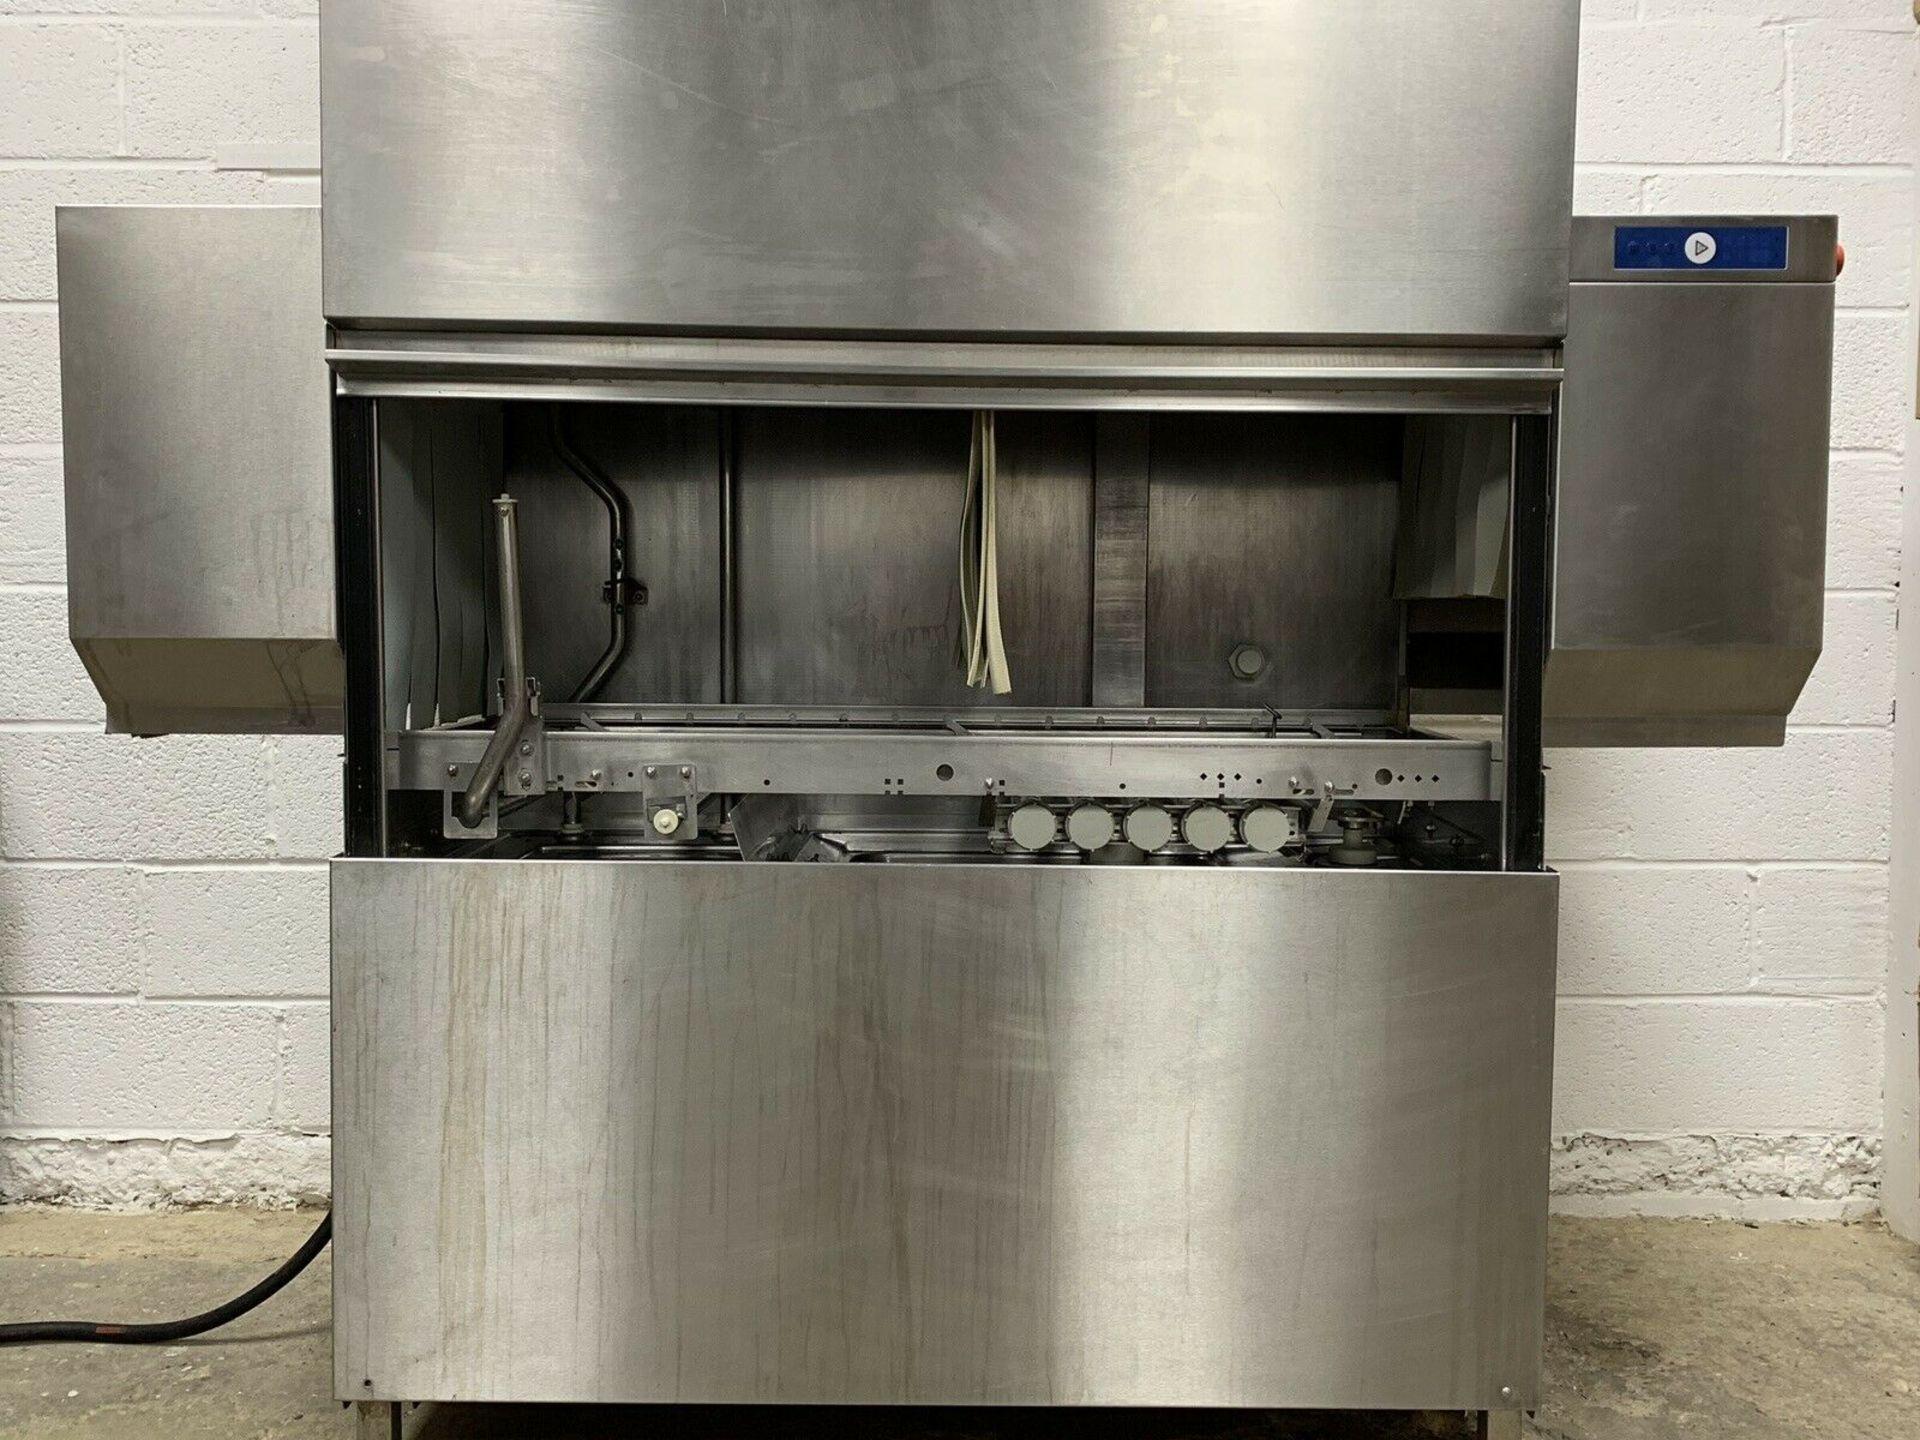 Lot 73 - Hobart CAN Conveyor Rack Dishwasher